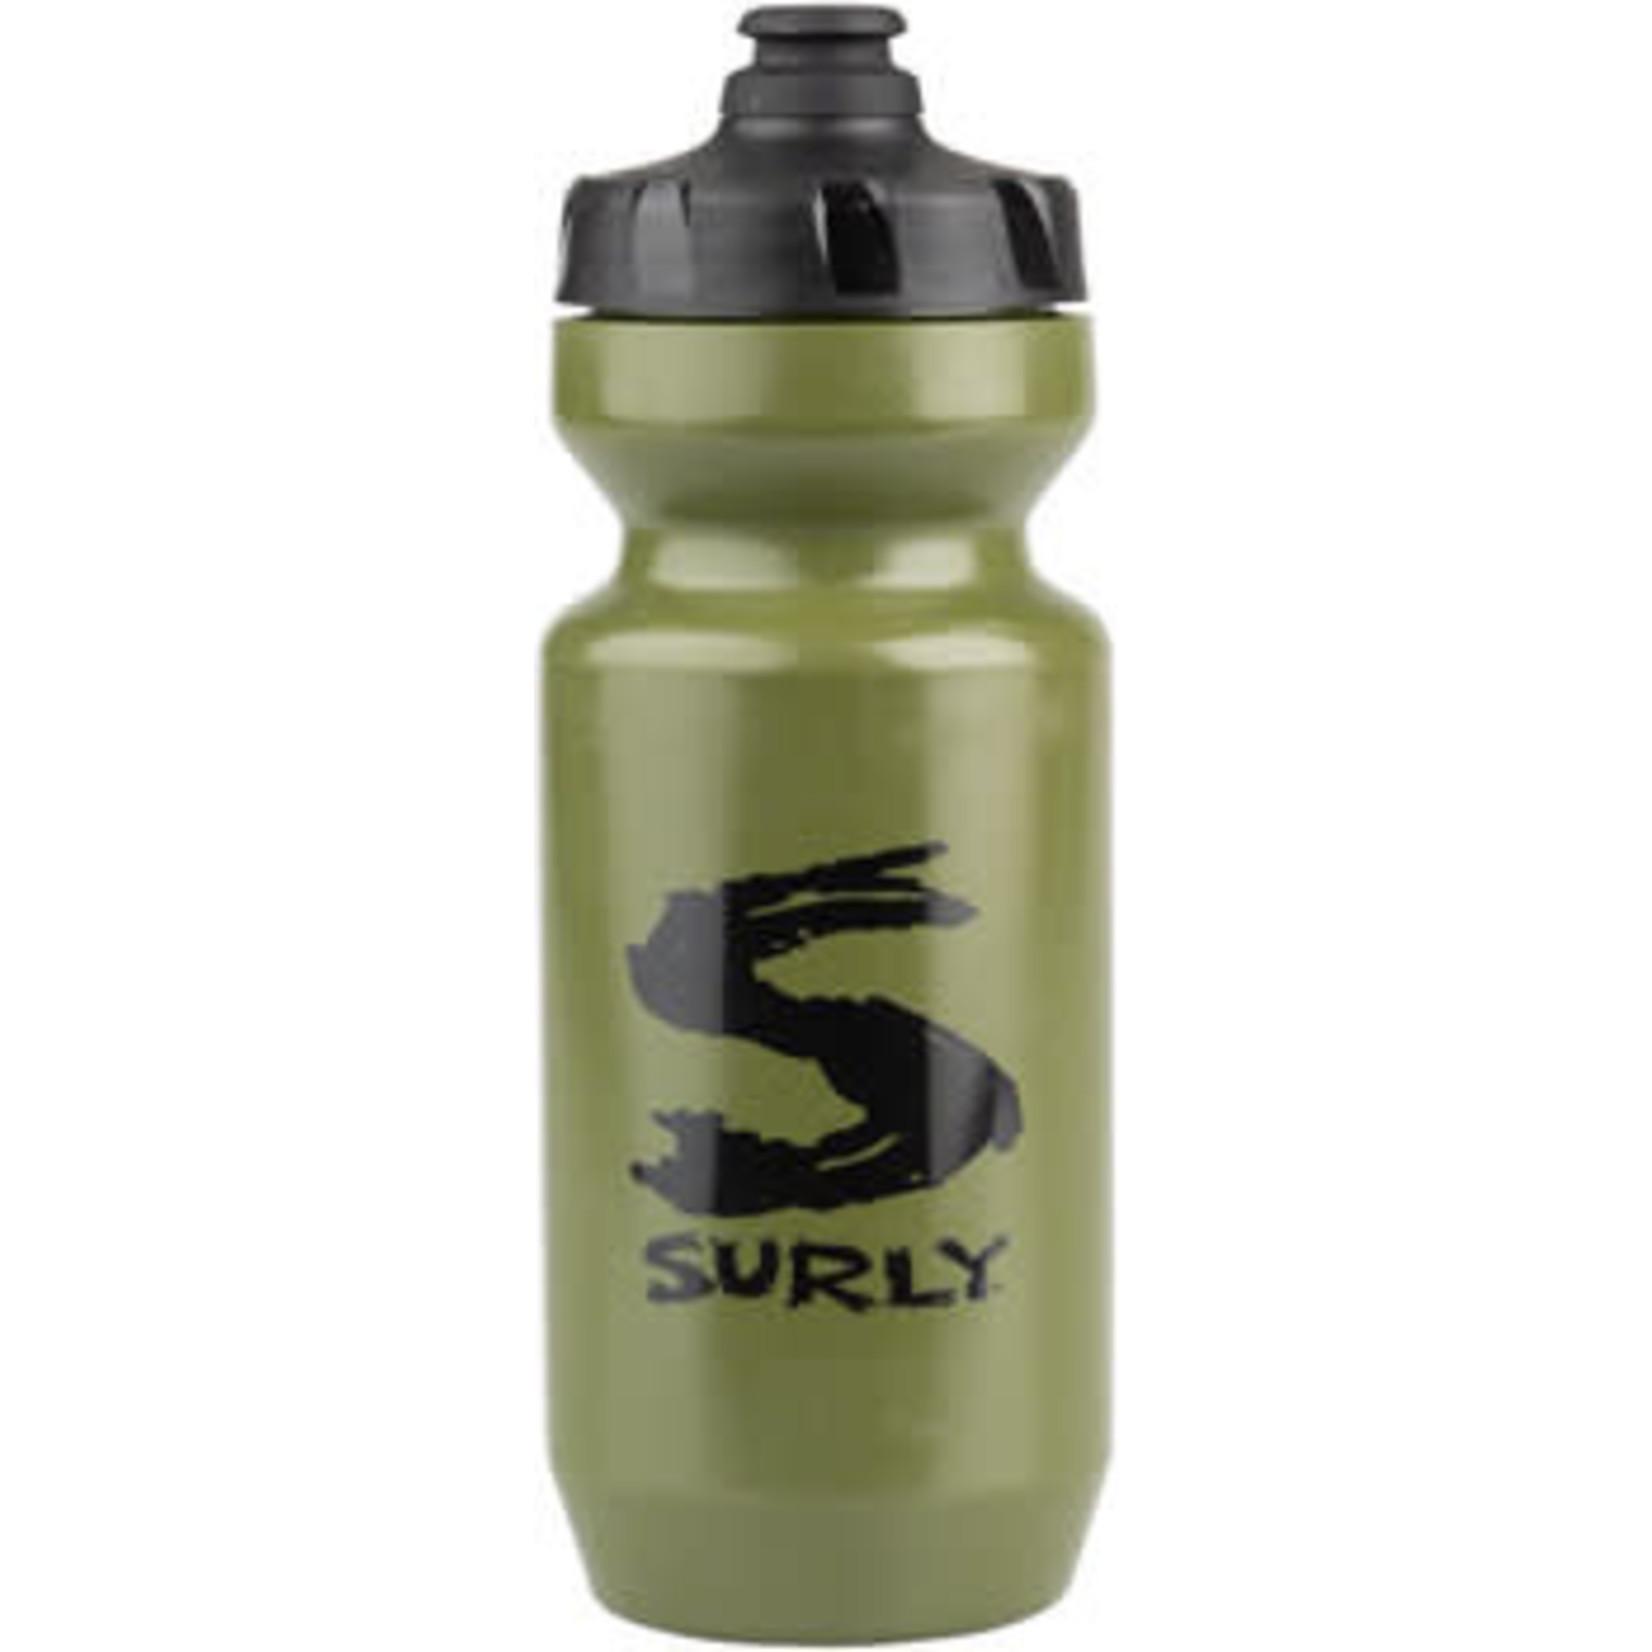 Surly Surly Big S Purist Water Bottle - Green, Black, 22oz